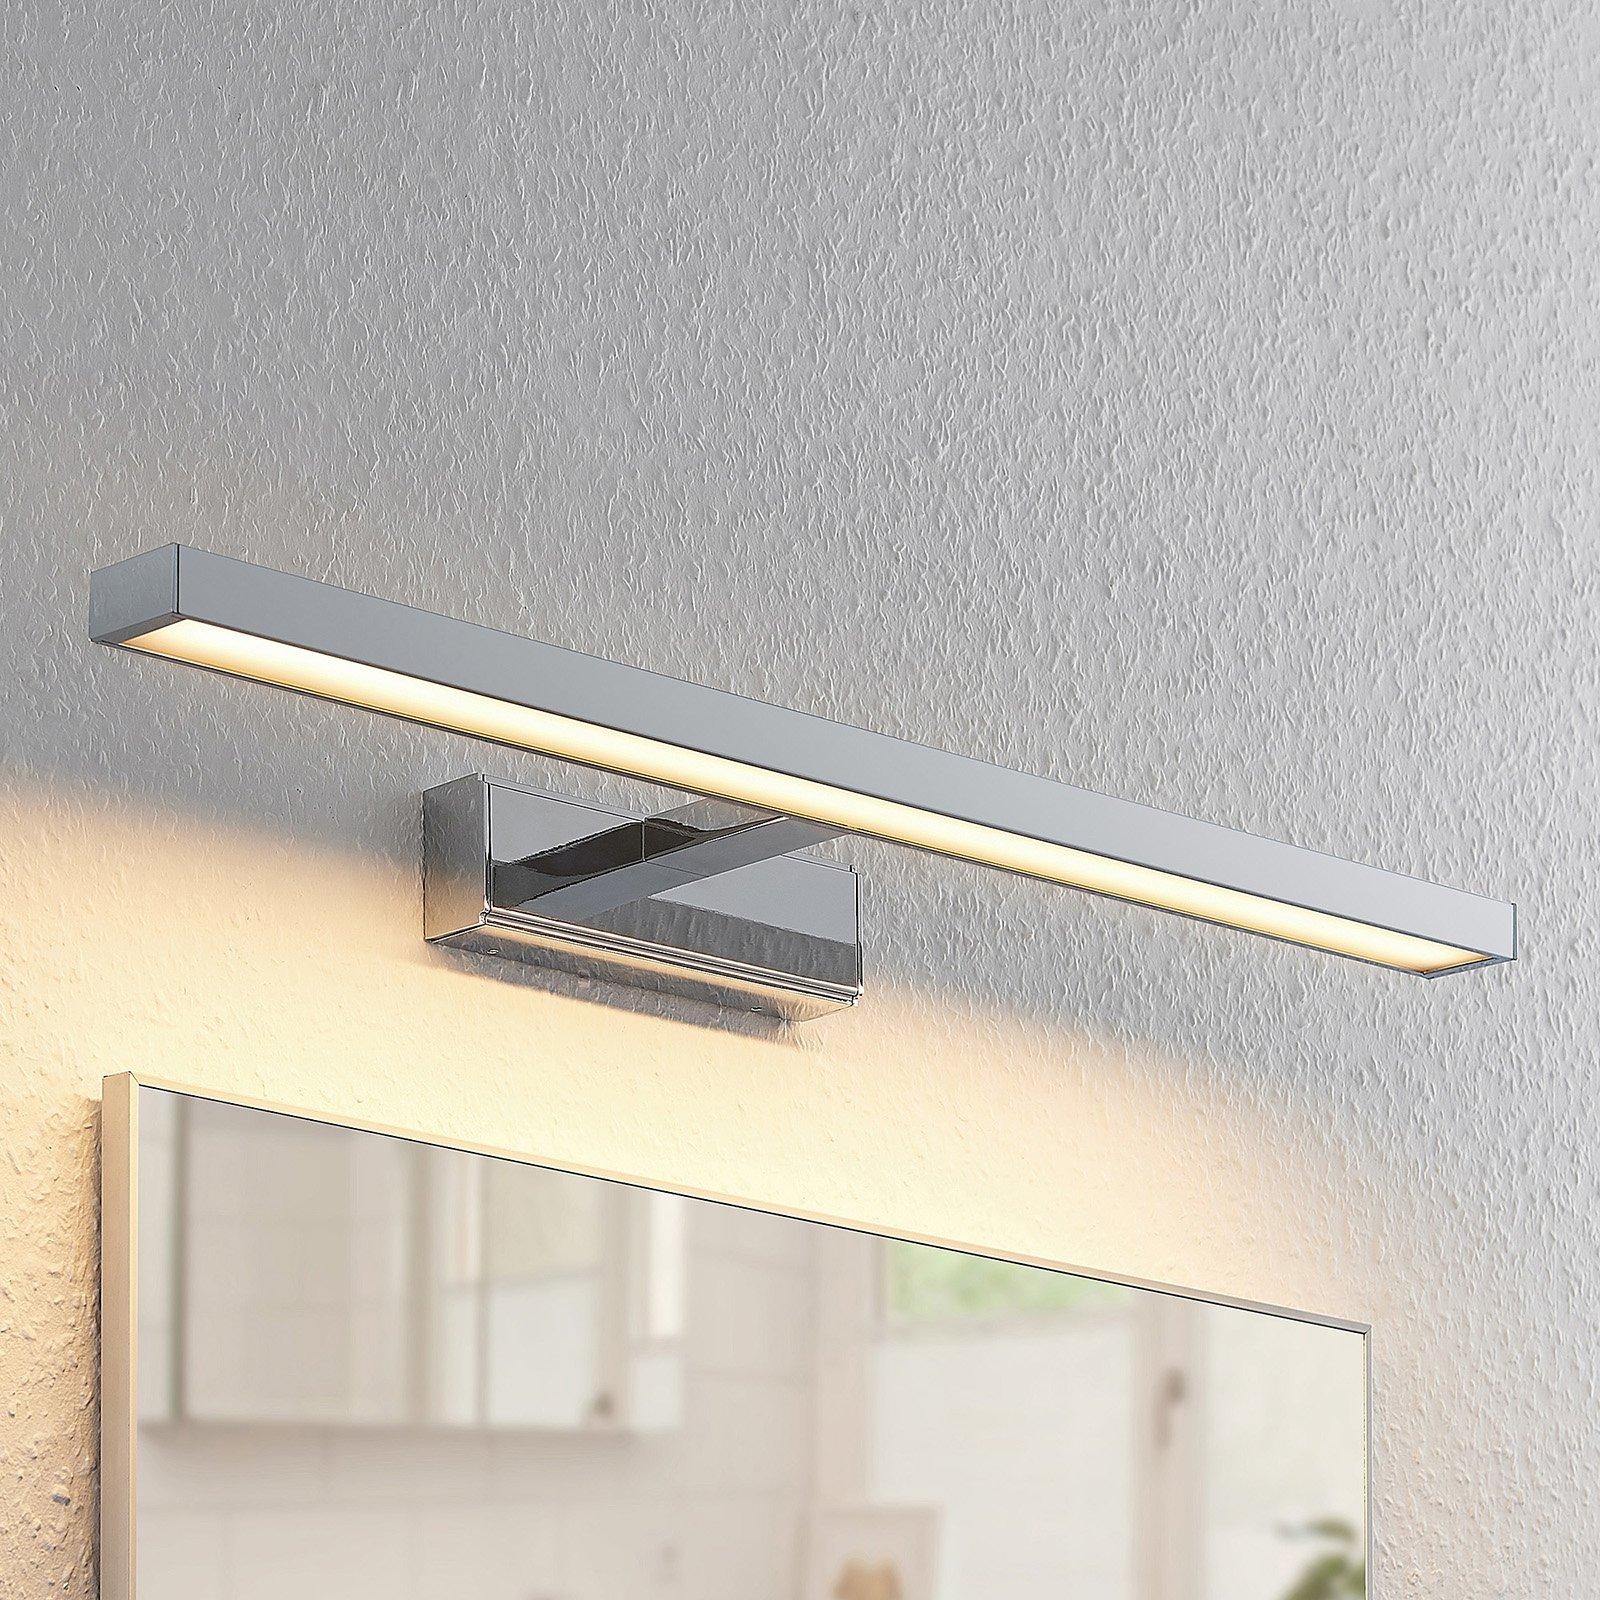 Lindby Jukka LED-speillampe til bad 60 cm